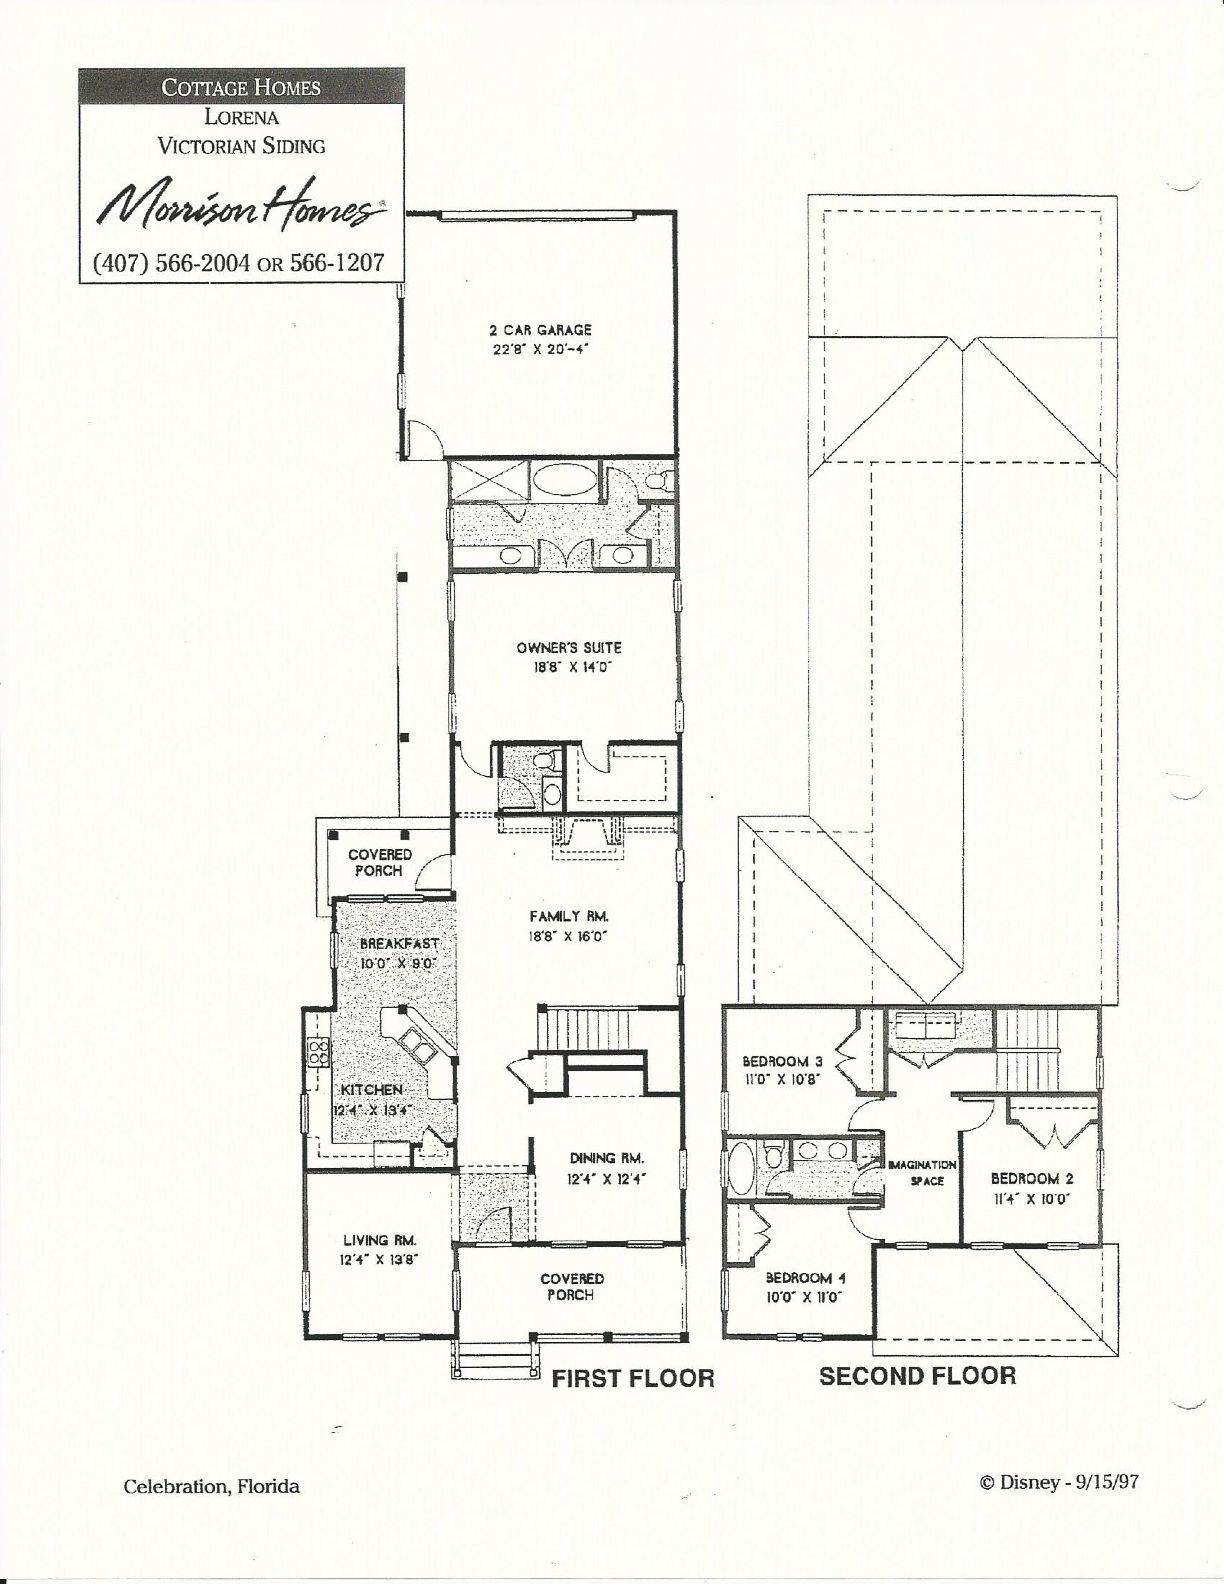 Lorena Victorian Siding Floor Plans In Celebration Fl Floor Plans Morrison Homes Model Homes